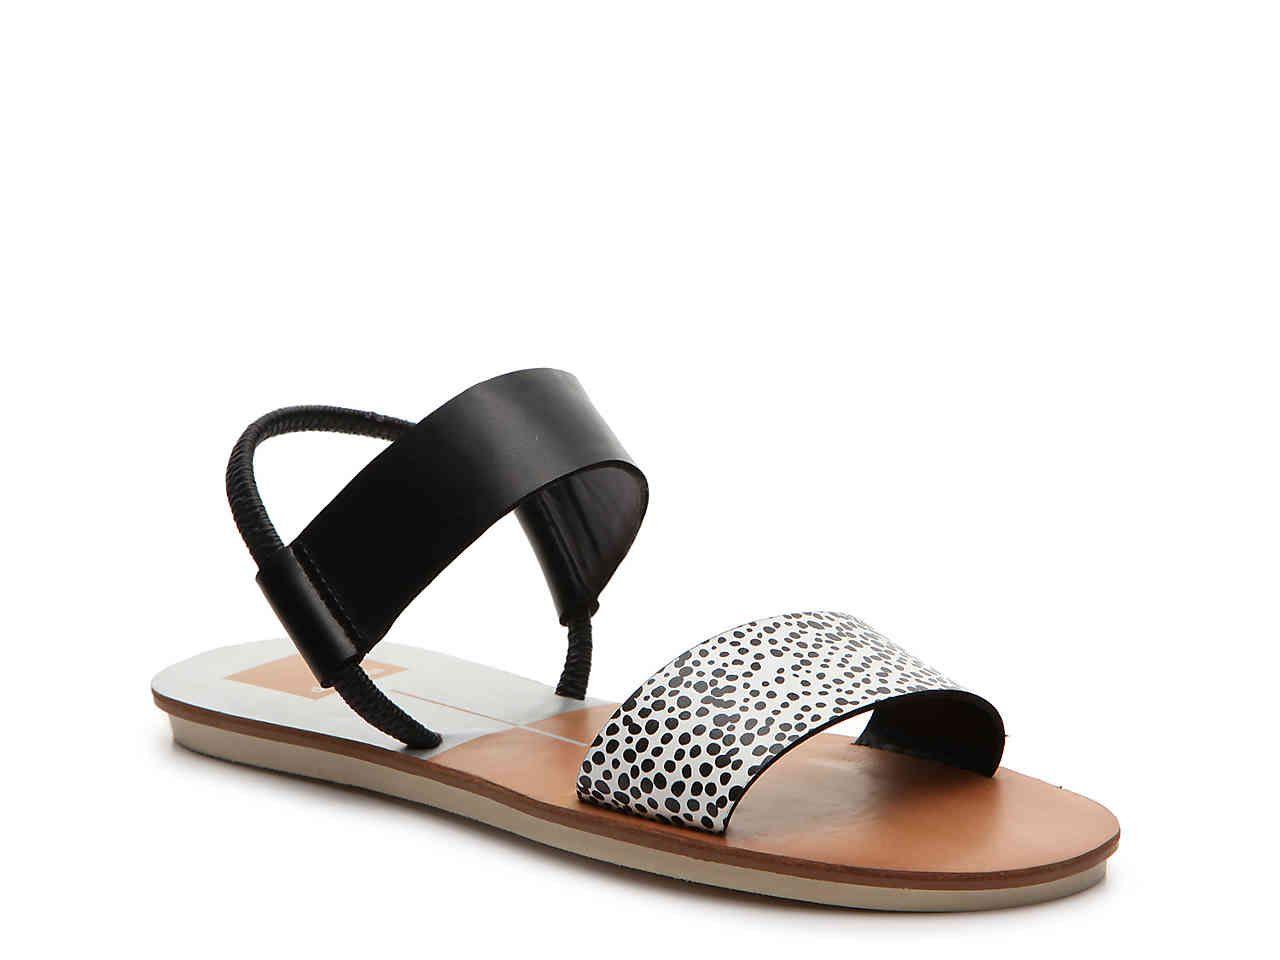 Dolce Vita Neily Flat Sandal Women's